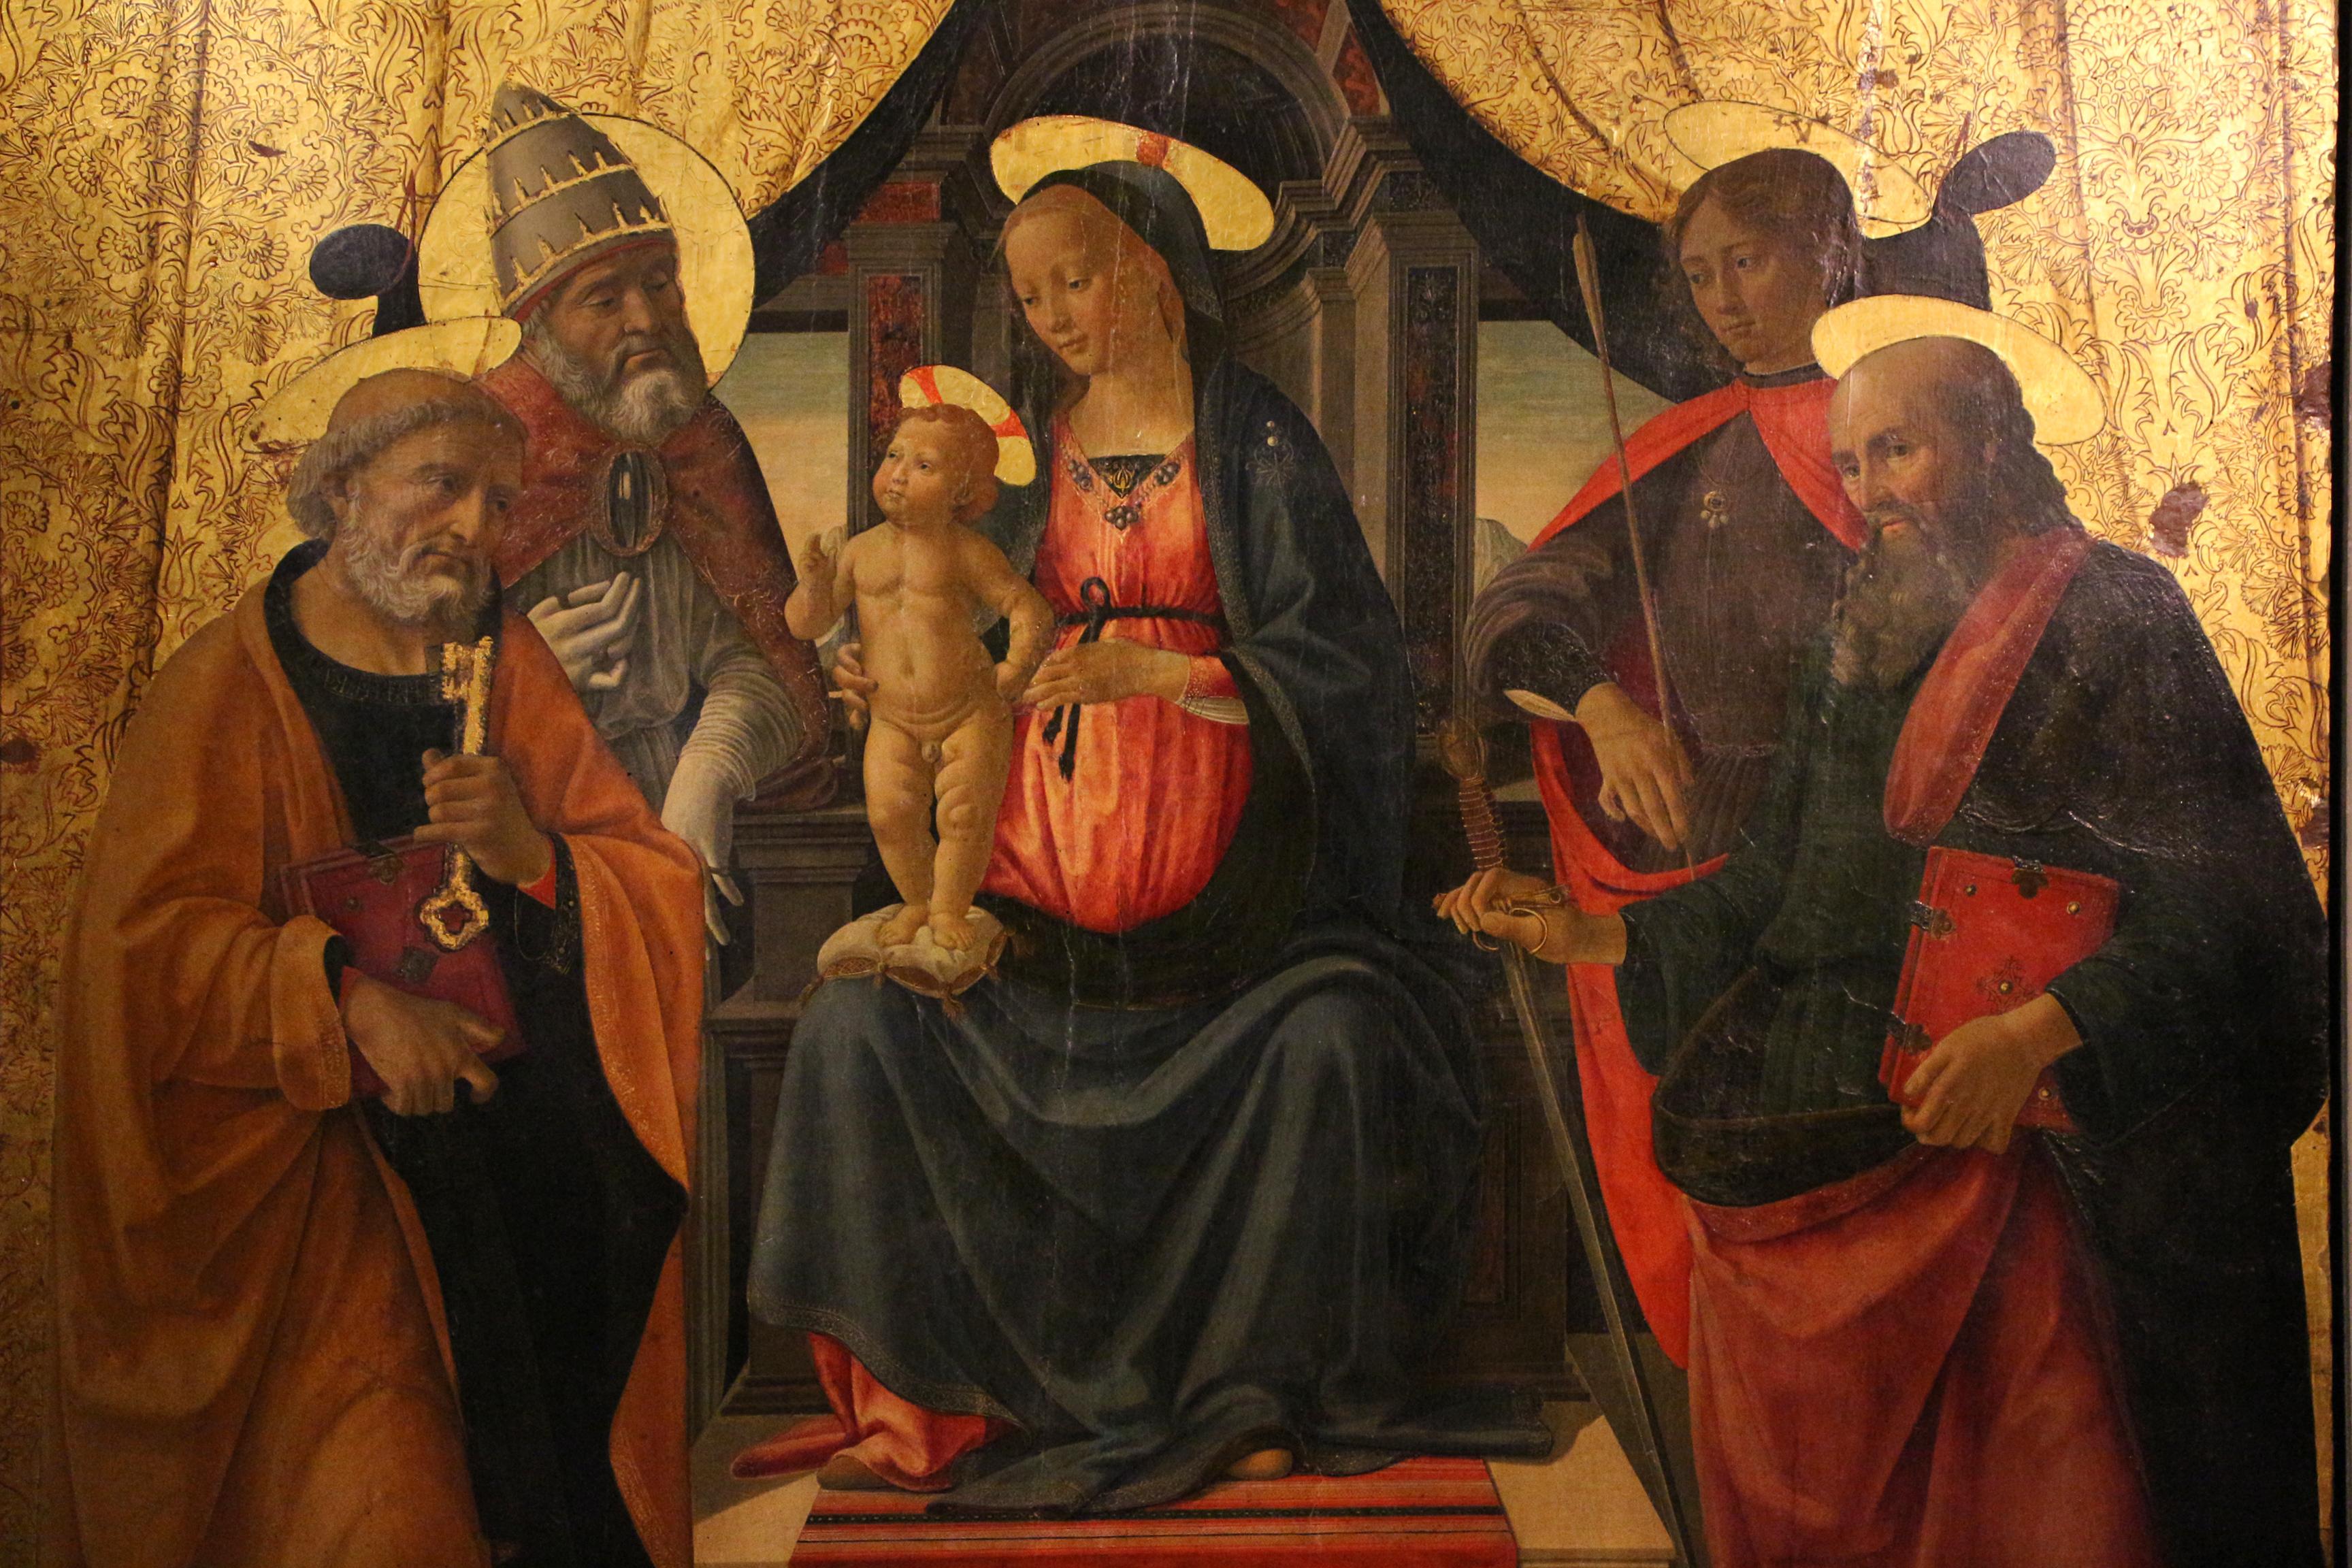 File:Domenico ghirlandaio, sacra conversazione di lucca, 1479, 03.JPG